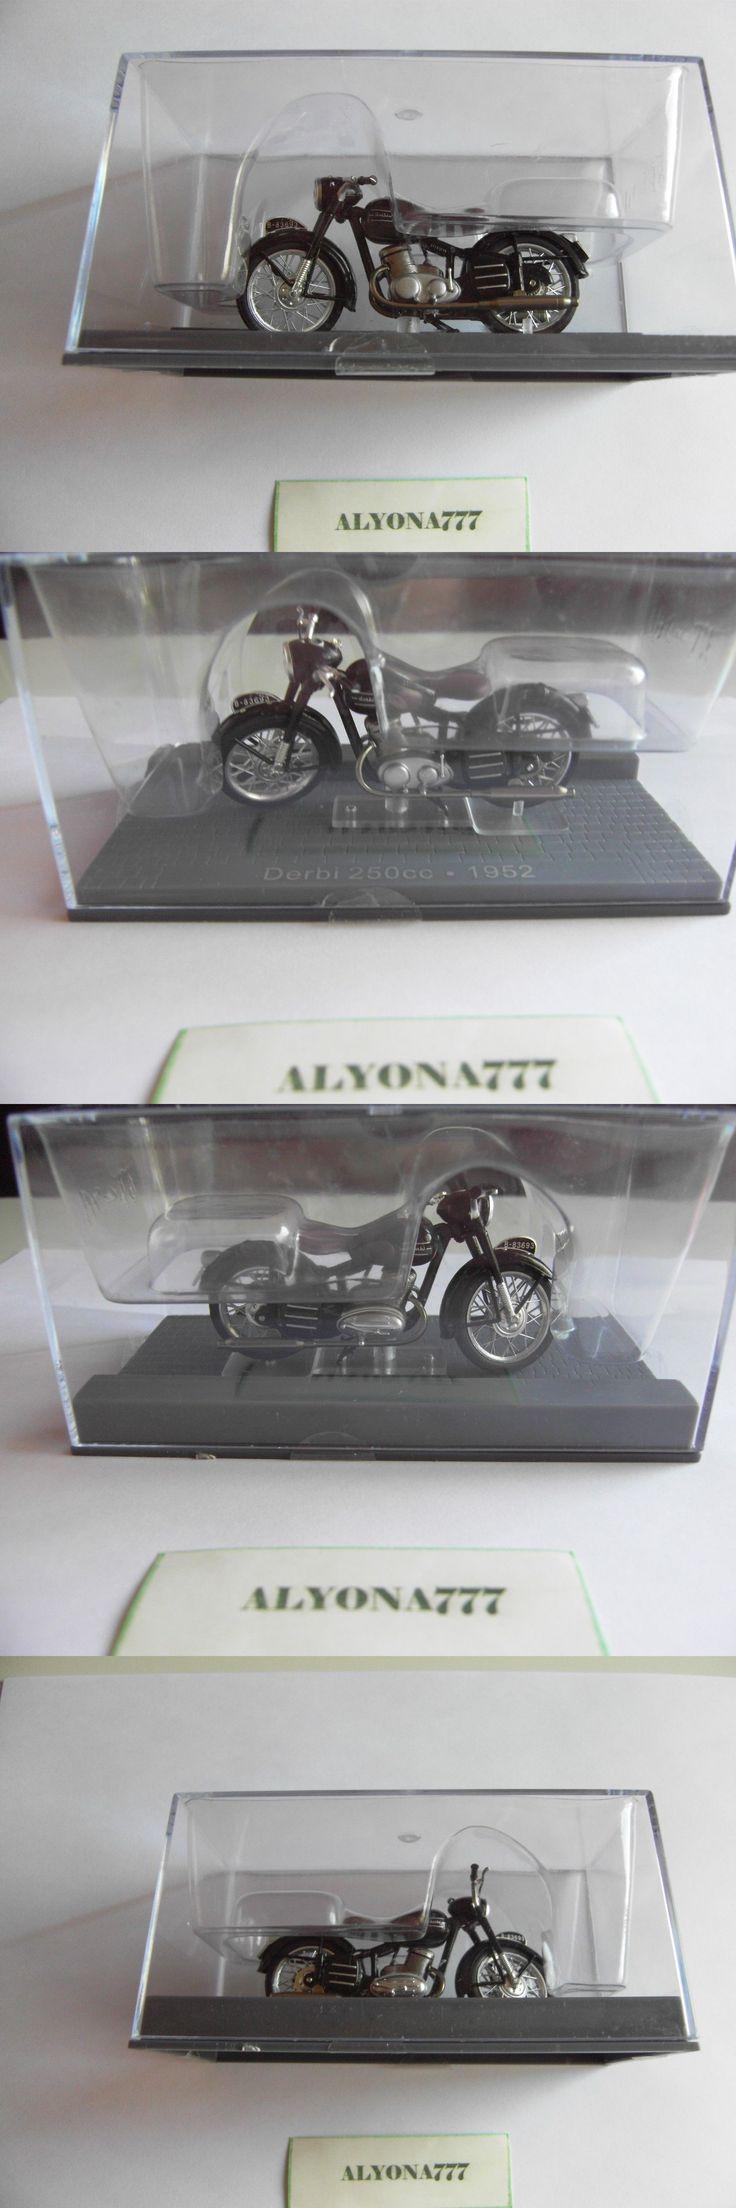 Contemporary Manufacture 45348: 1 24 Ixo Derbi 250Cc 1952 Moto Classic Bike Motorcycle 1:24 Altaya Ixo New -> BUY IT NOW ONLY: $34 on eBay!